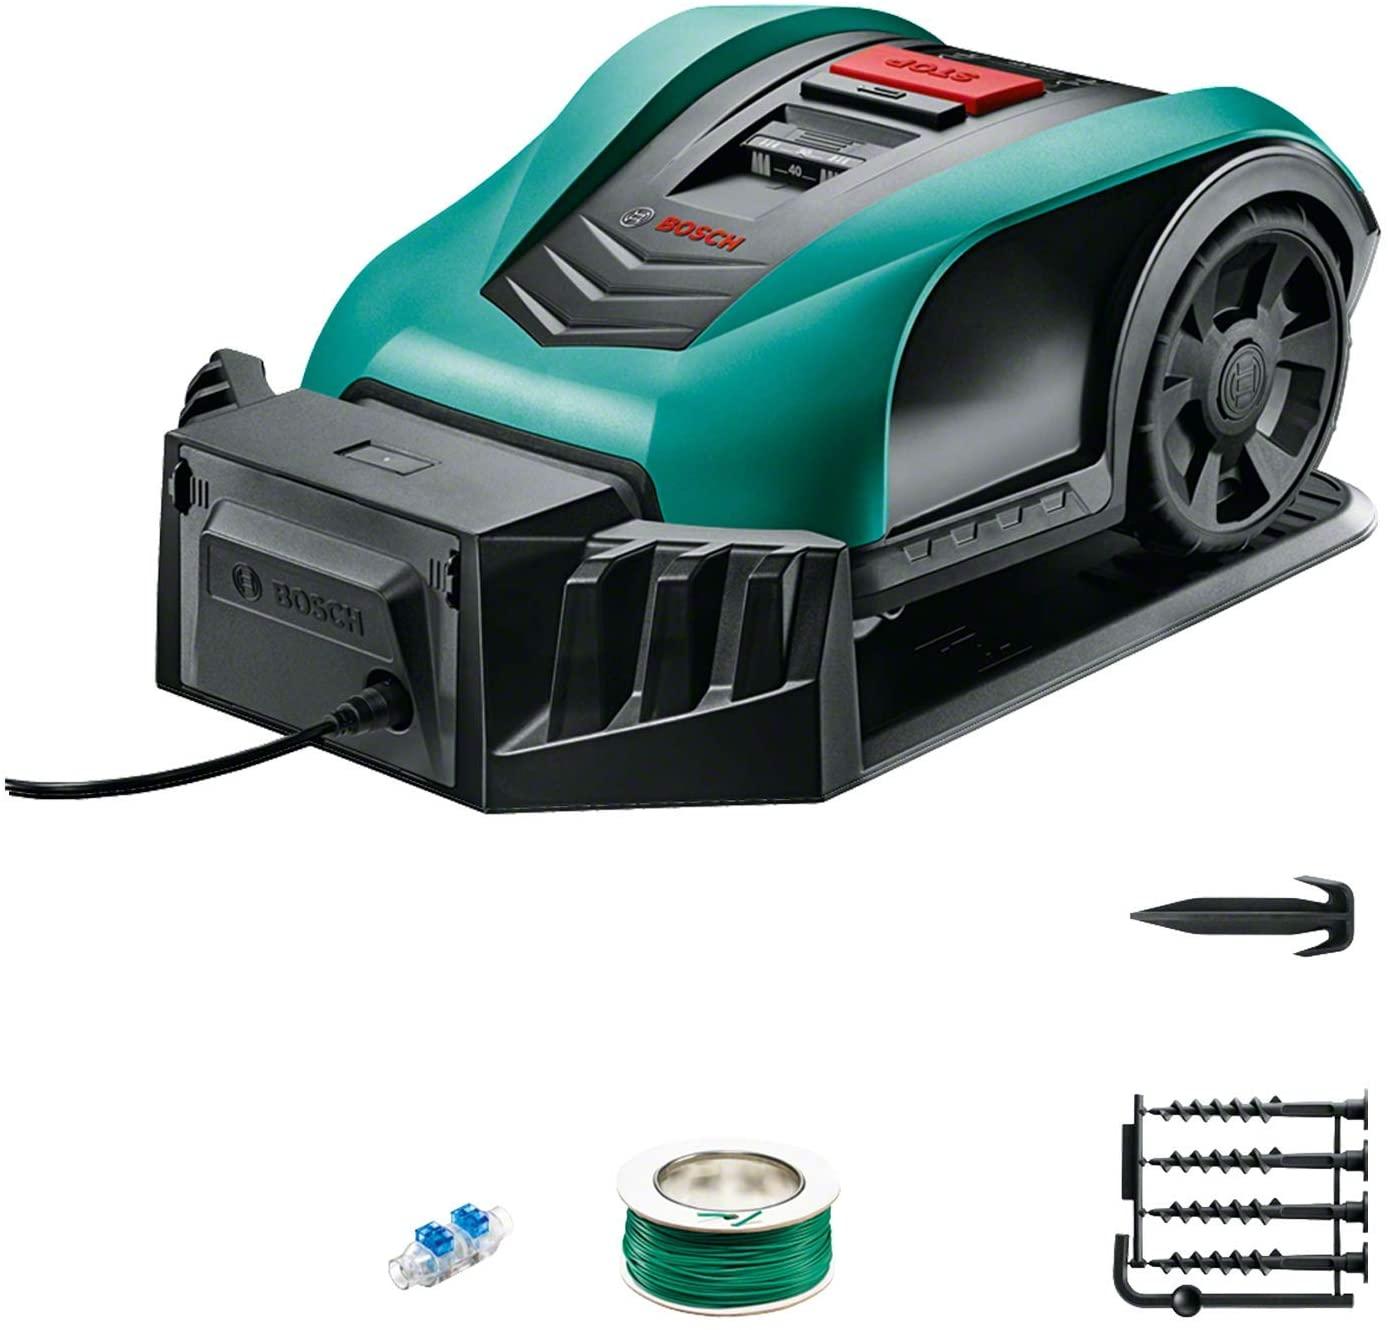 Recensione Robot Tagliaerba Bosch Indego S 350